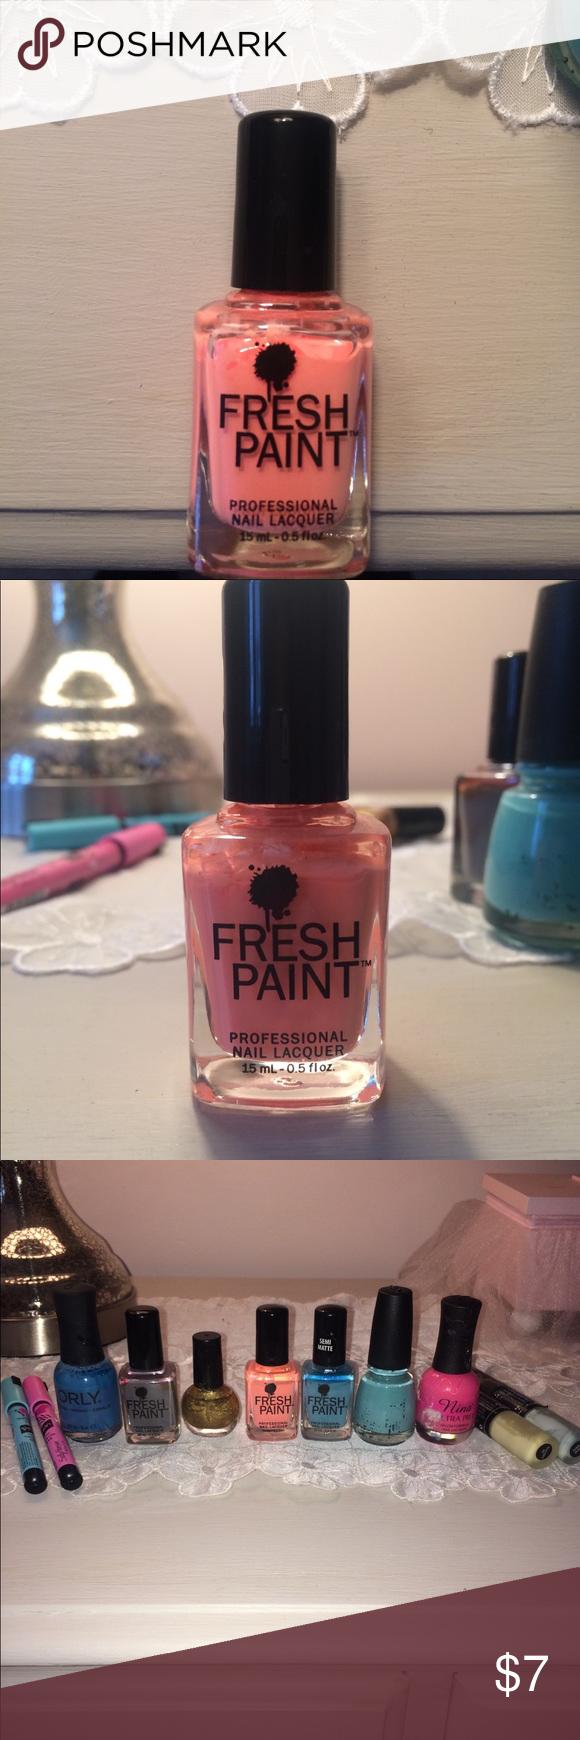 Fresh Paint Nail Polish in Guava   Pinterest   Orange pink, Customer ...